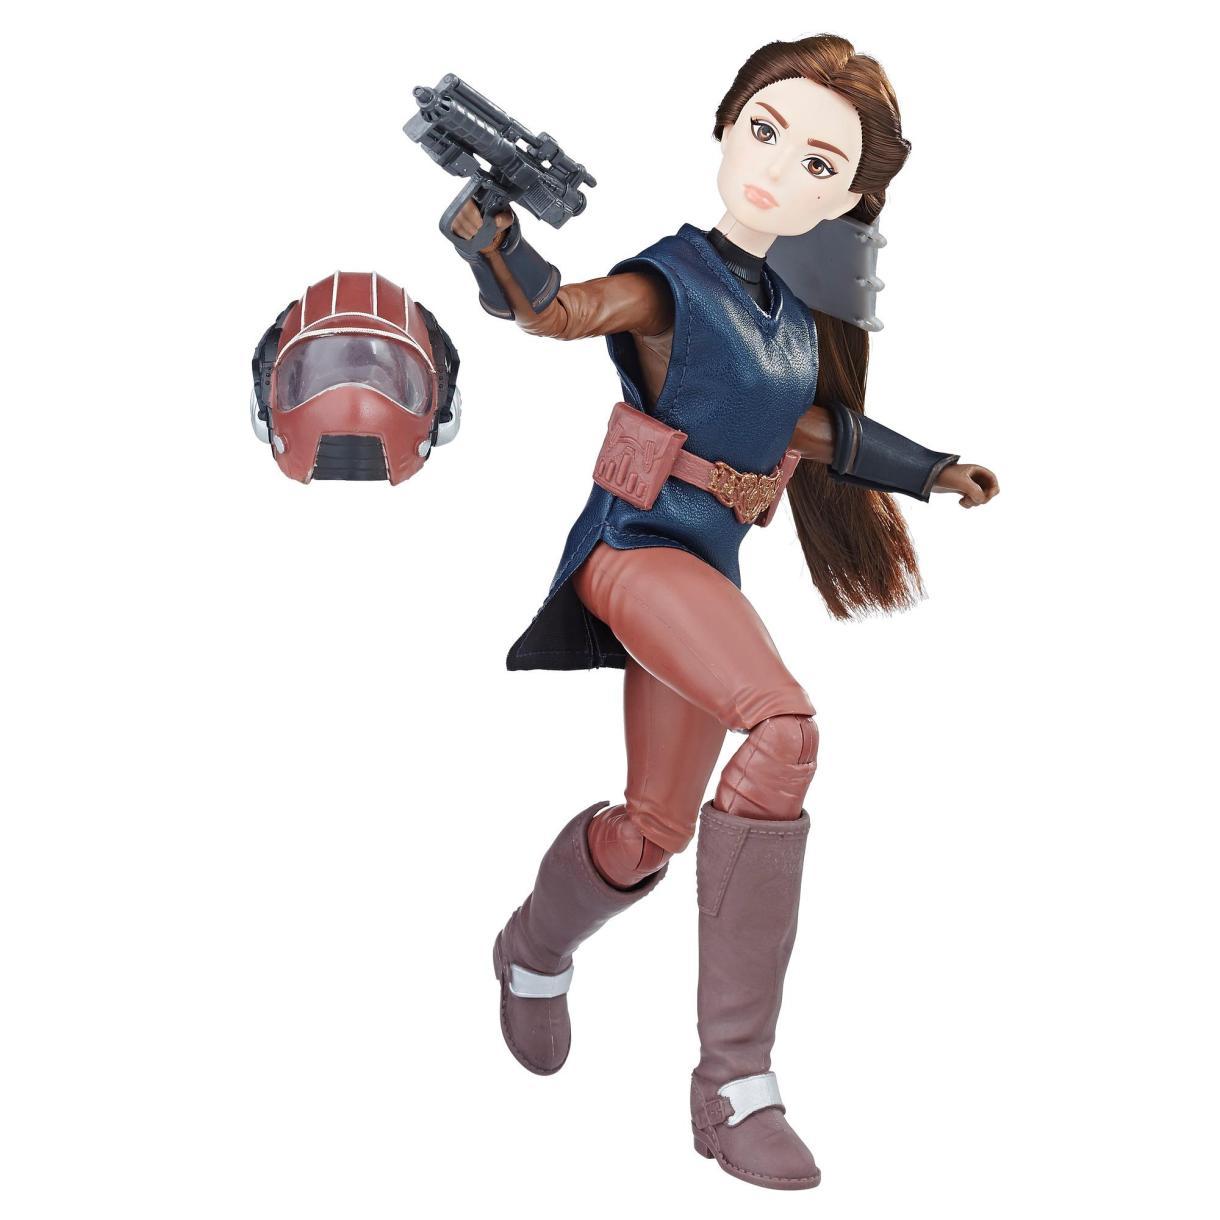 Star Wars: Forces of Destiny Padmé Amidala figure now available!